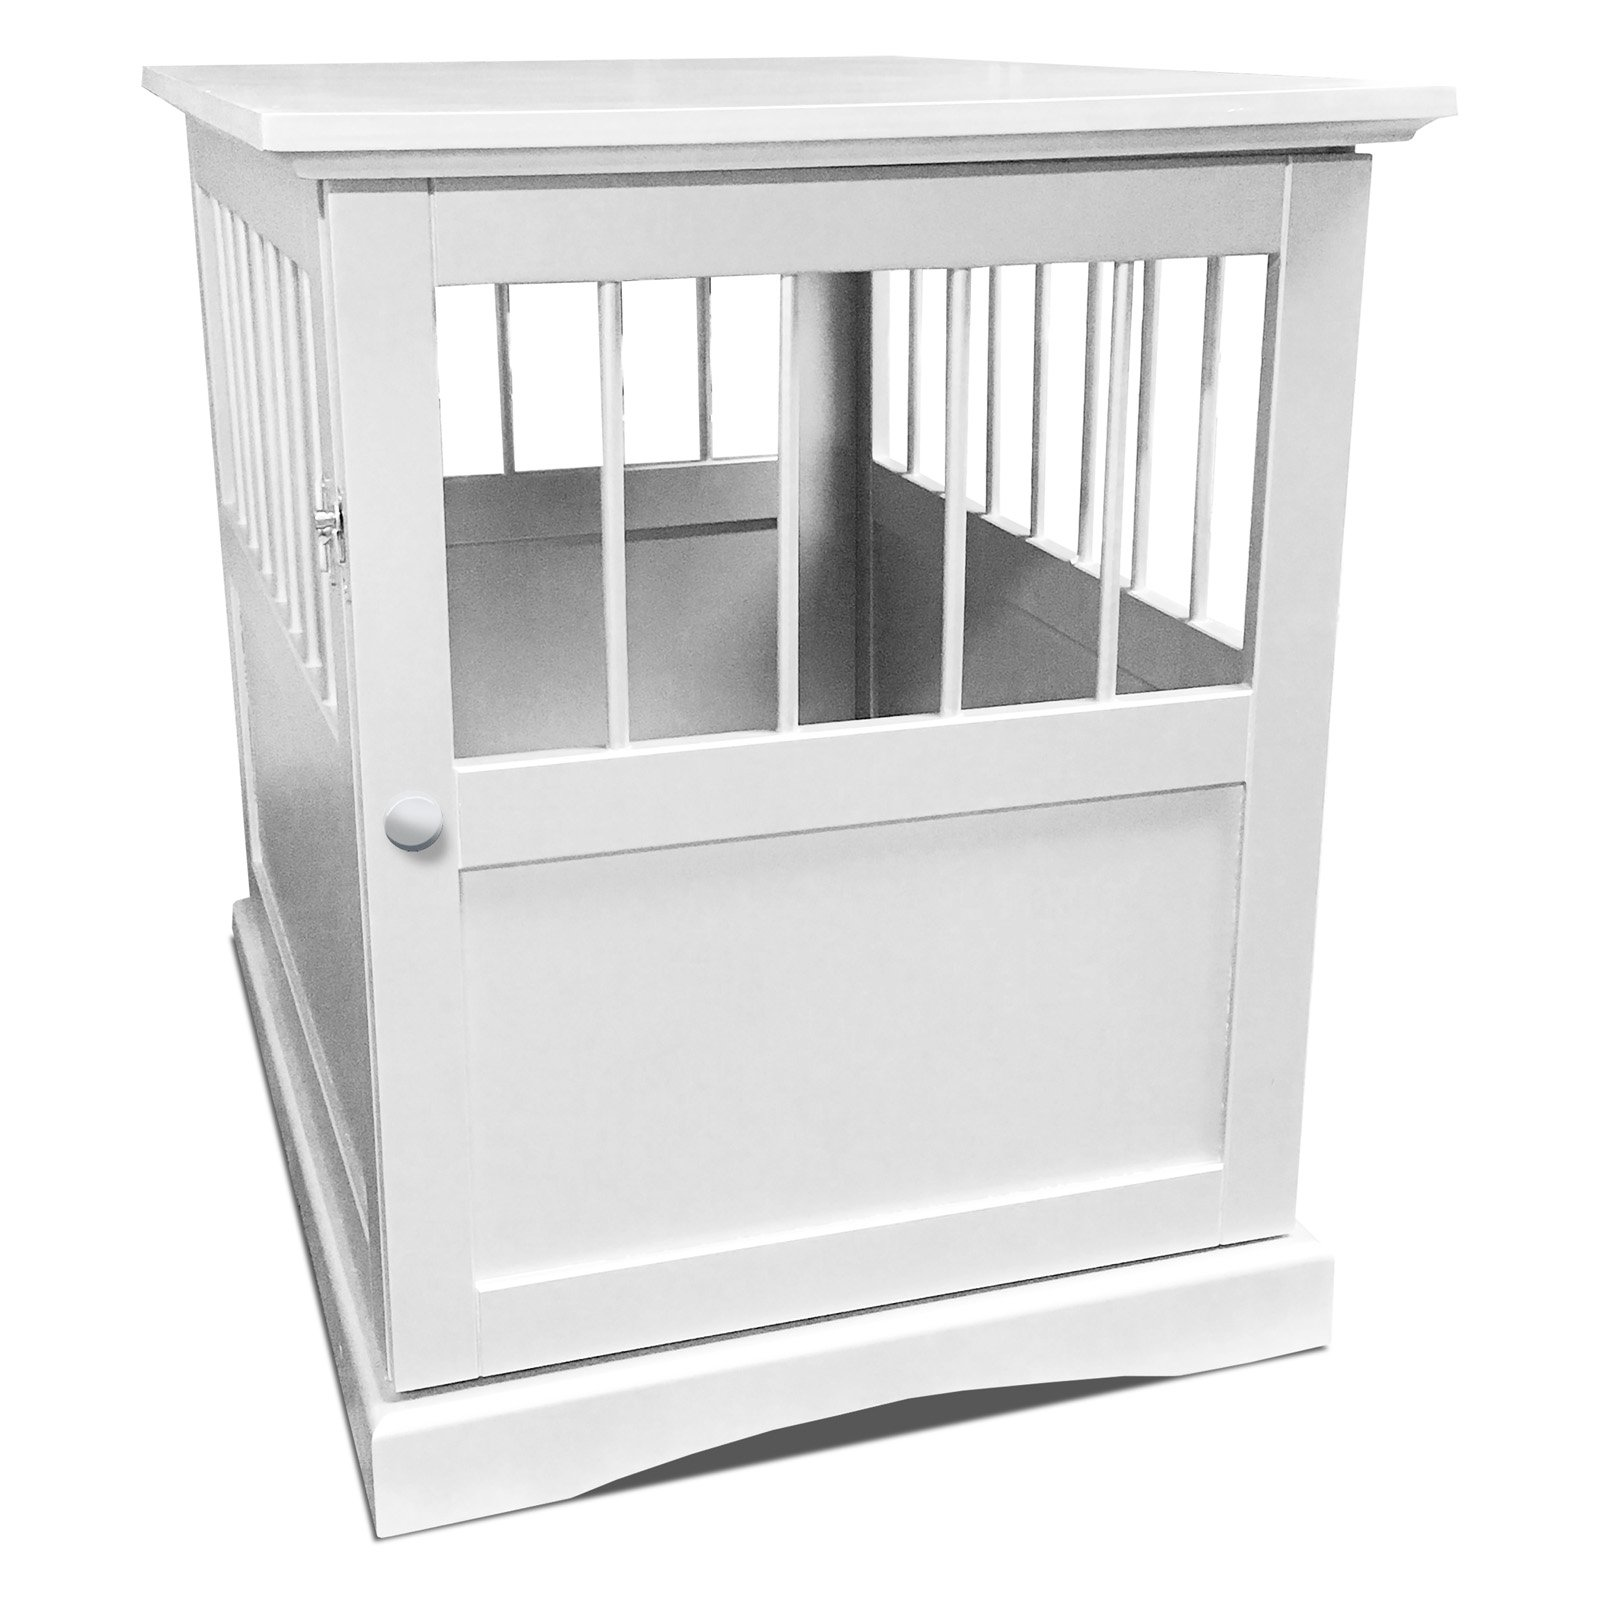 FurHaven Pet Crate End Table